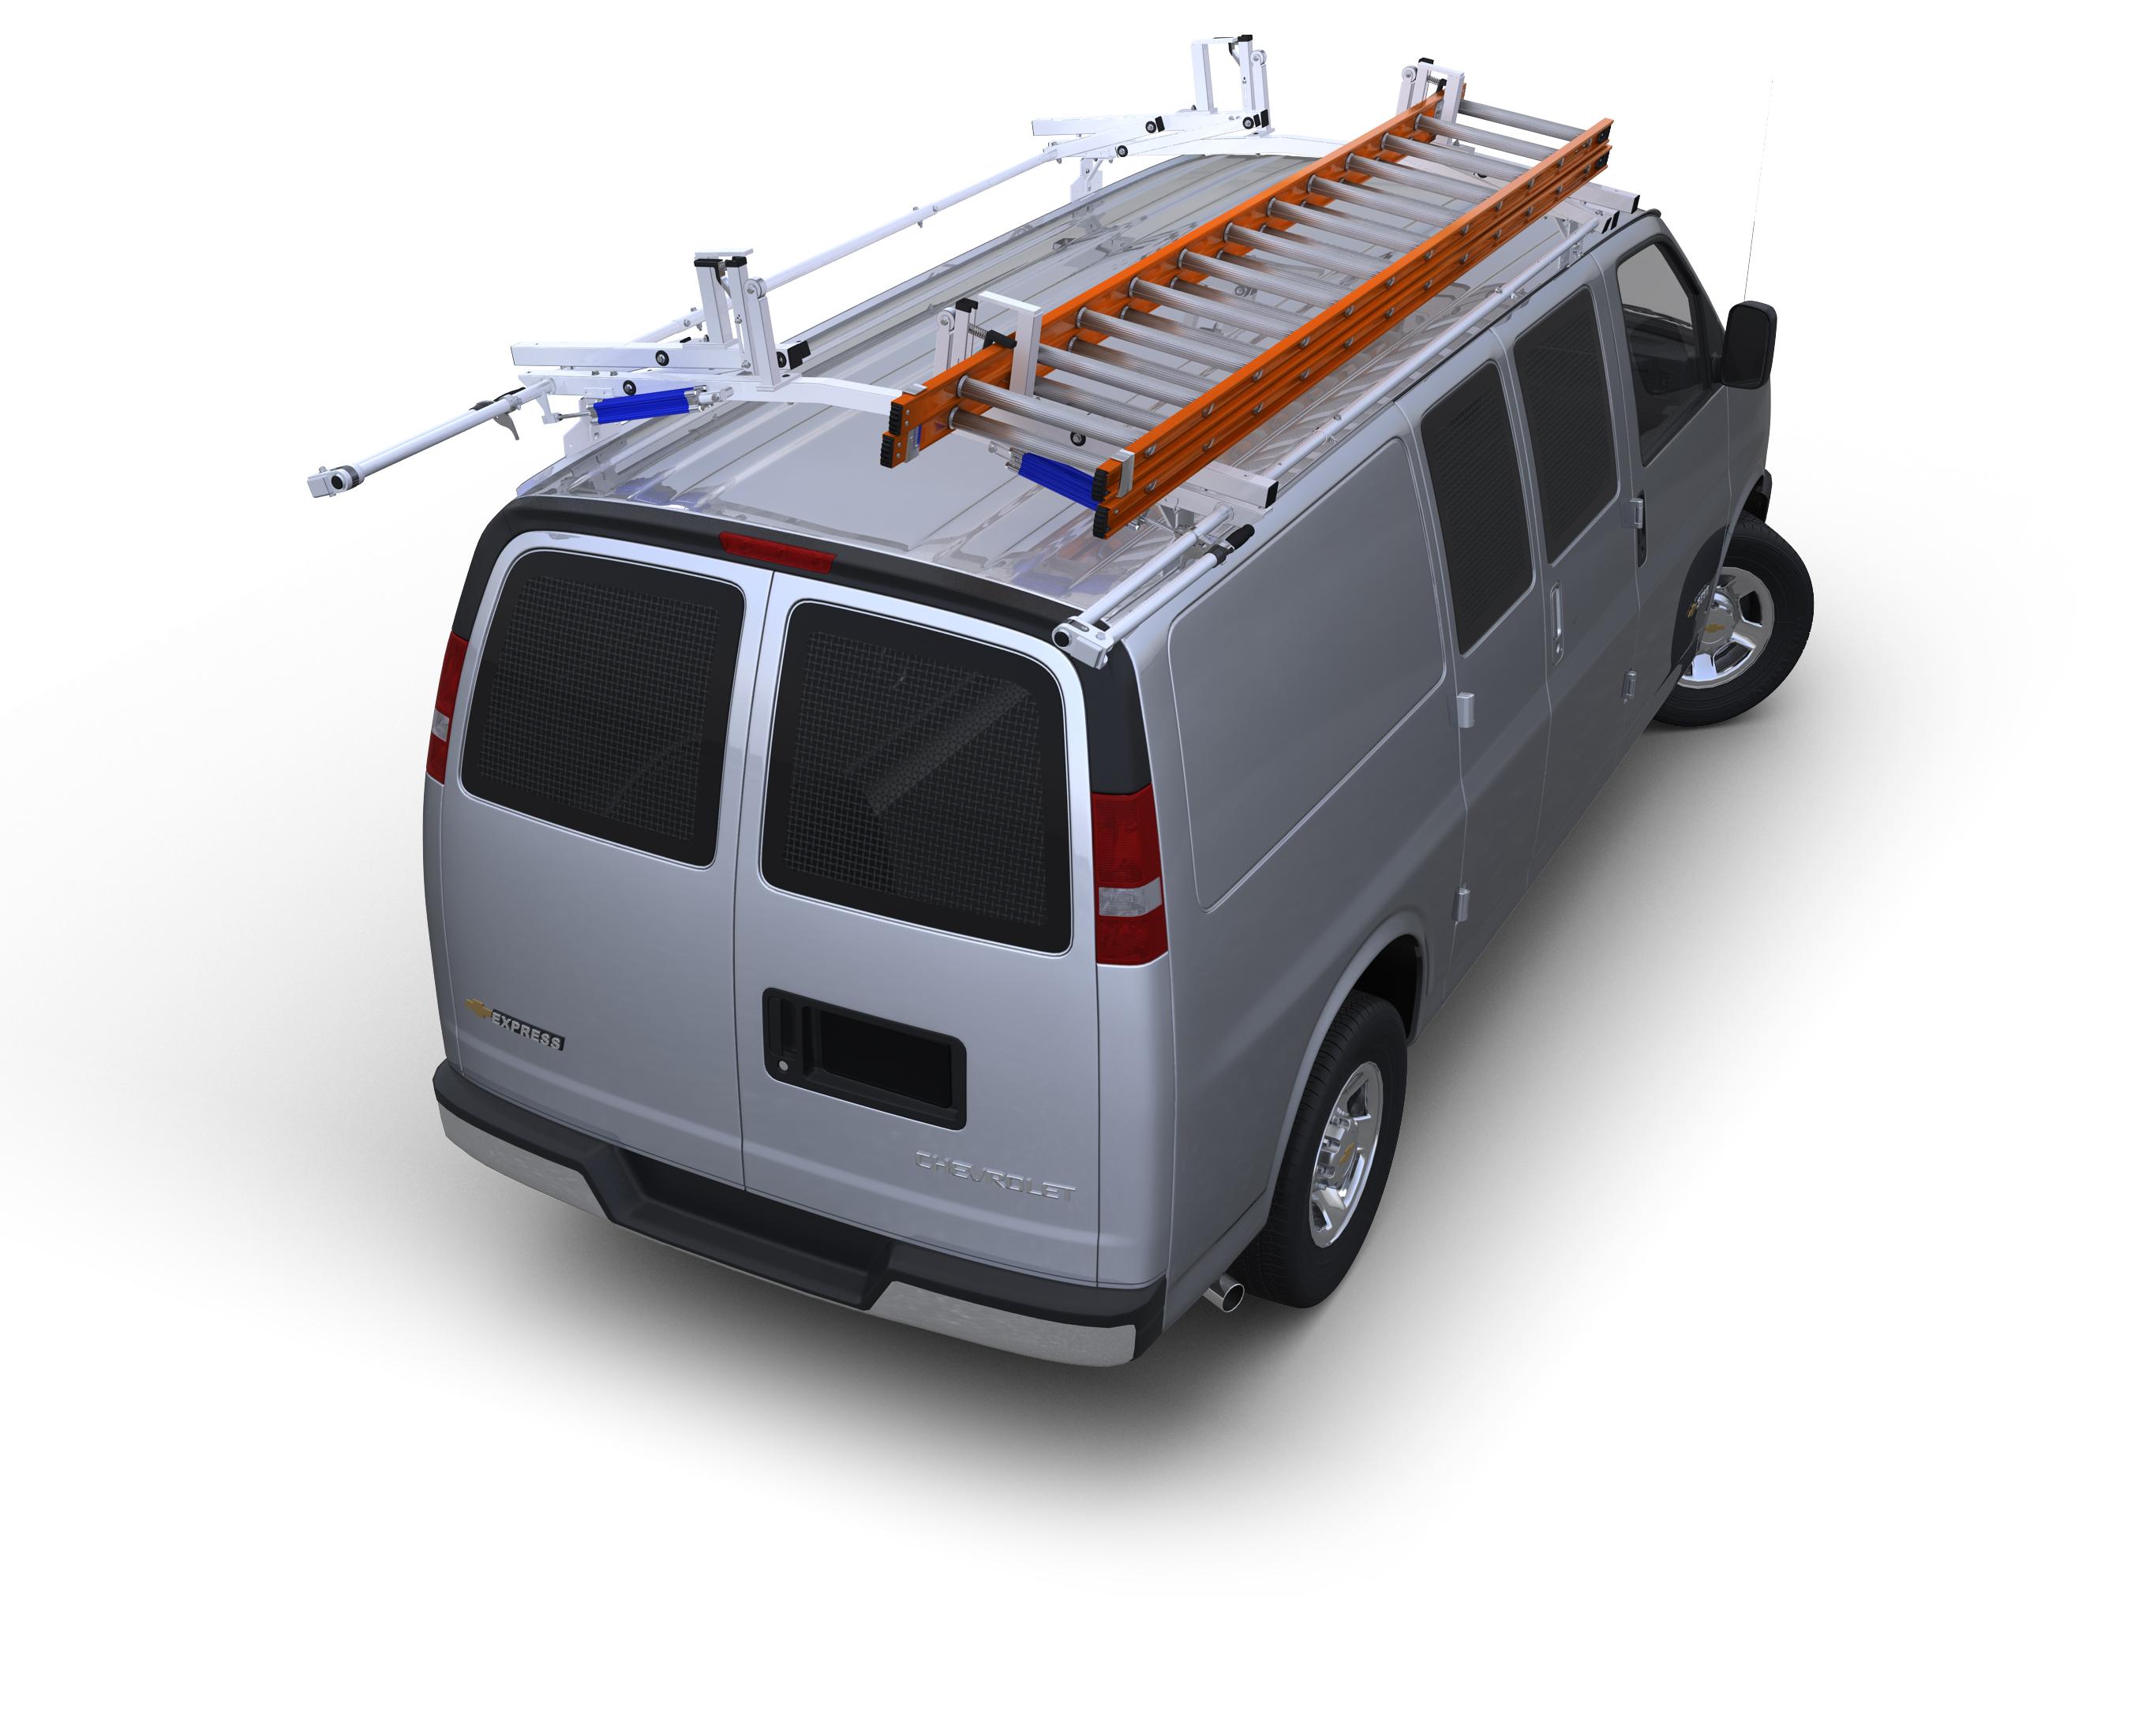 "MB Sprinter 144""WB High Roof Plumbing Van Package, Aluminum Shelving - SAVE $200!"